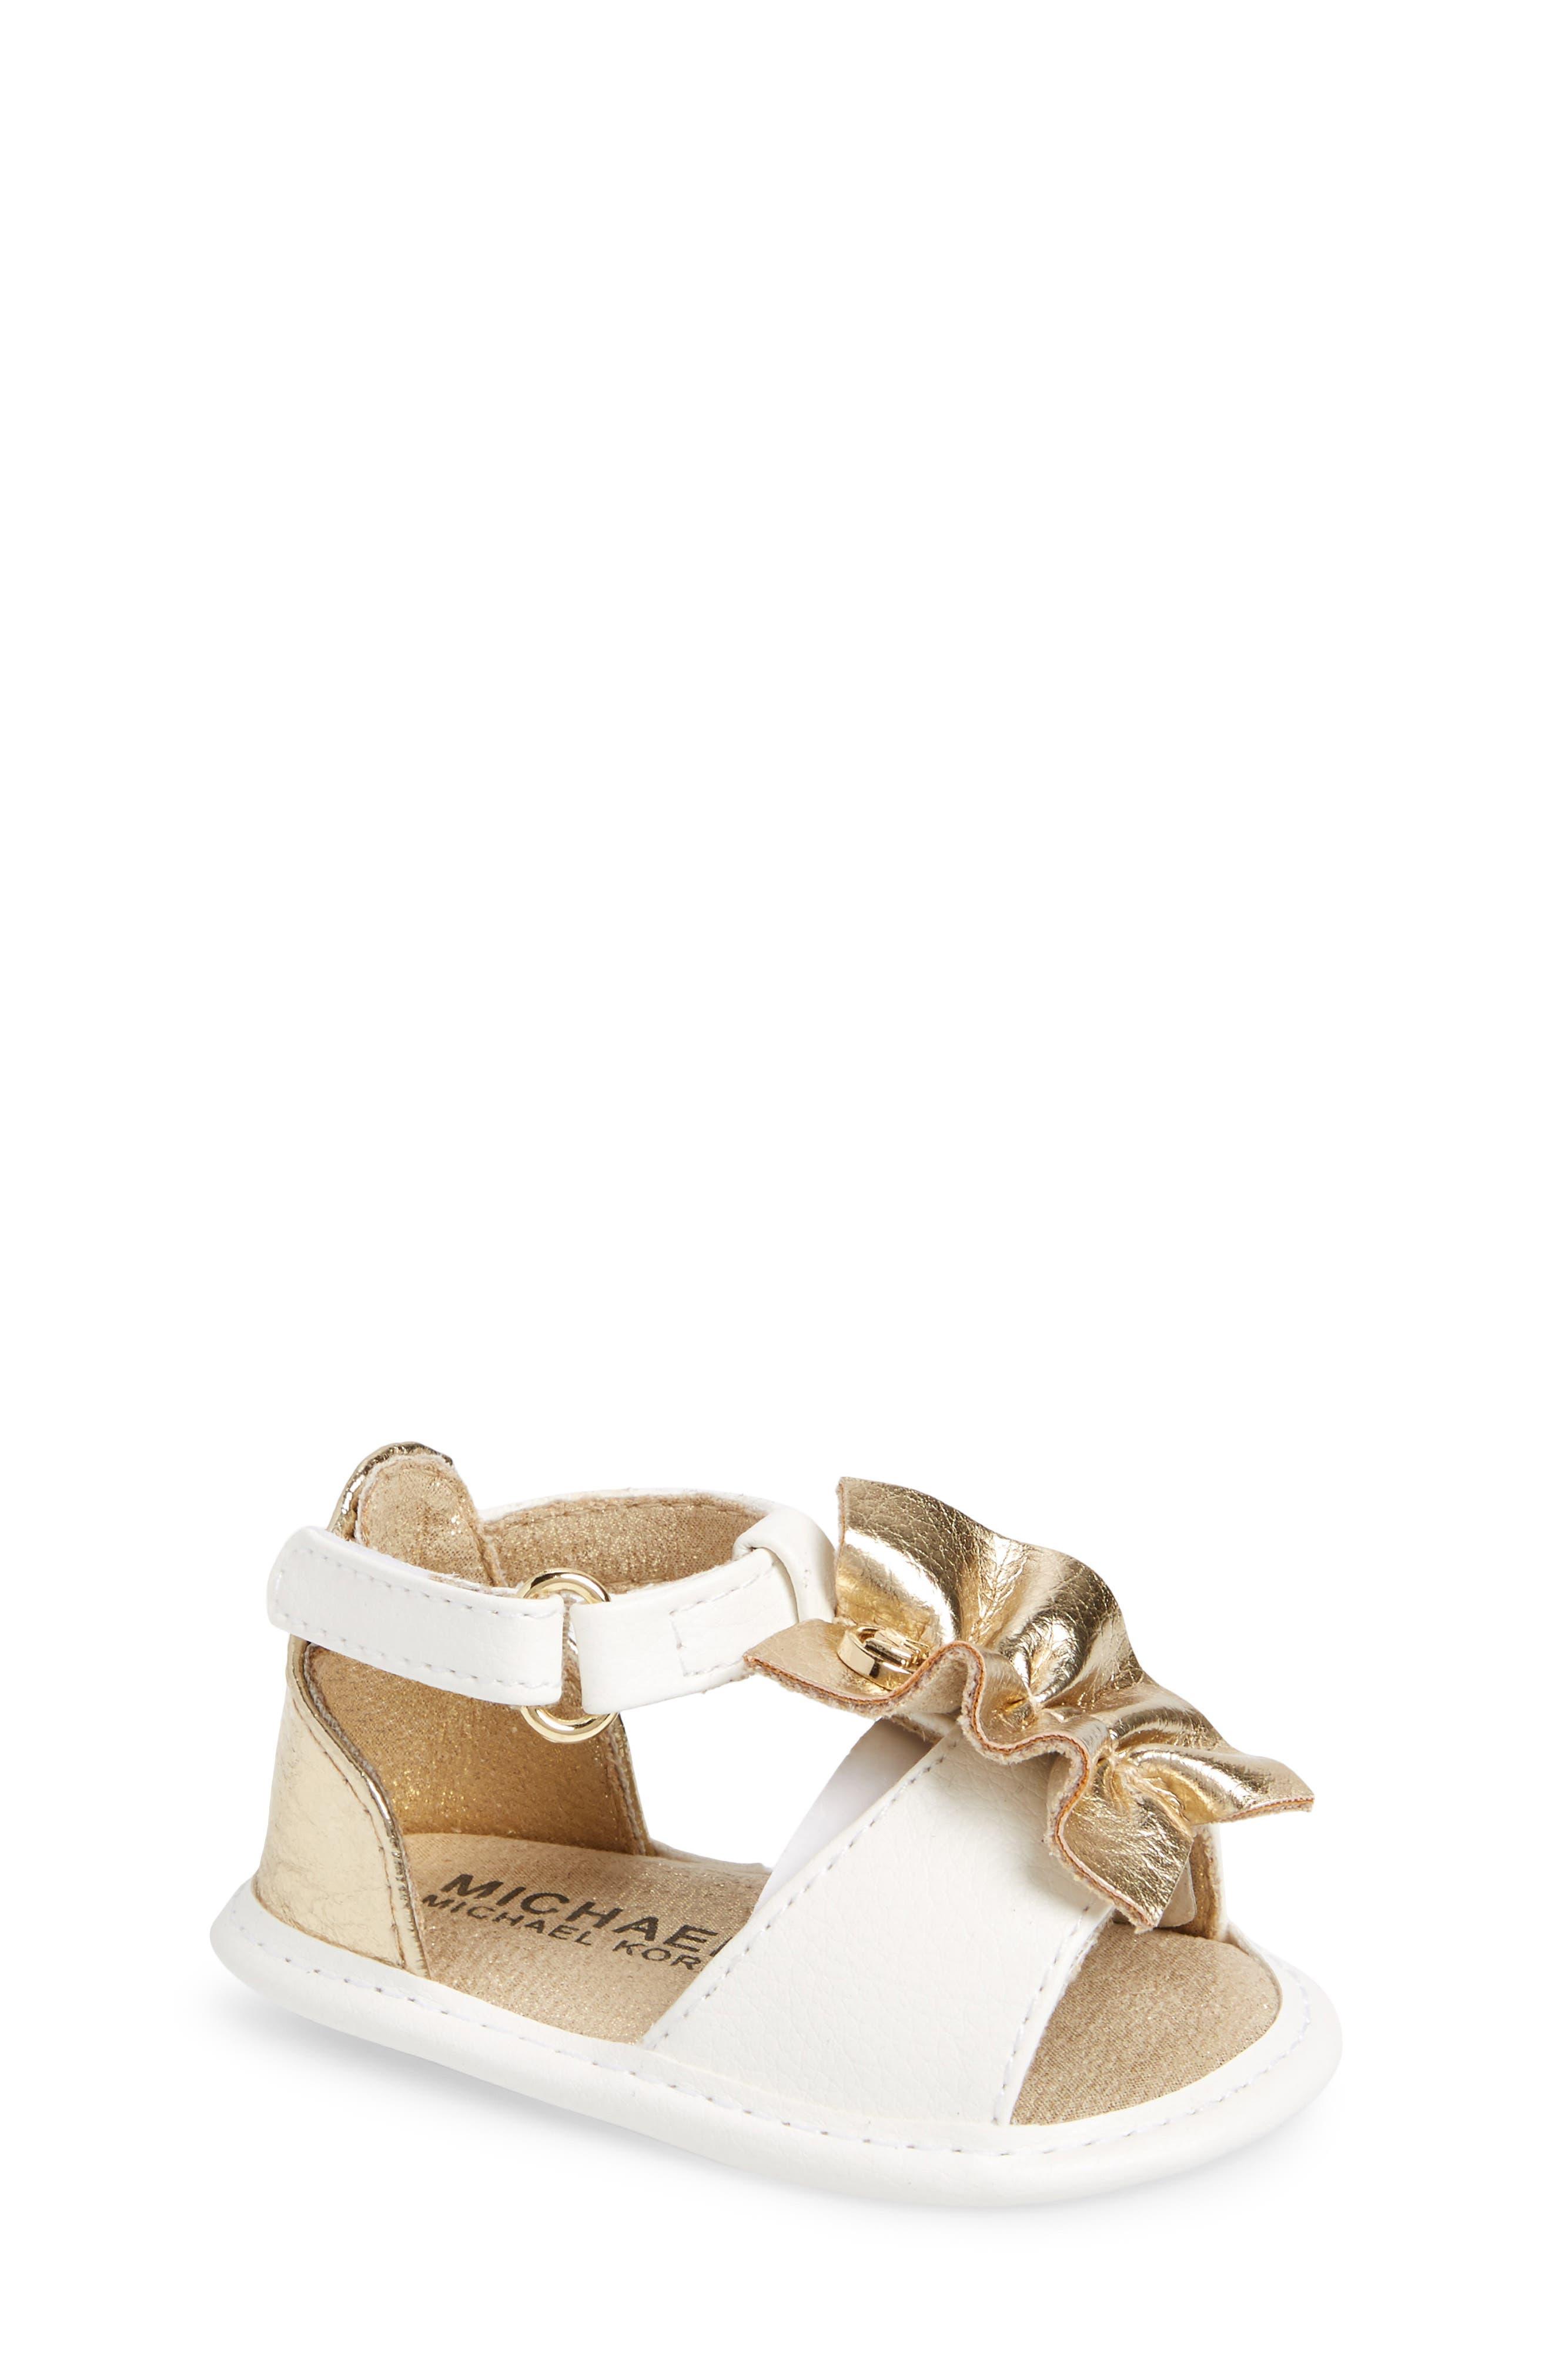 Clue Sandal,                             Main thumbnail 1, color,                             White Gold